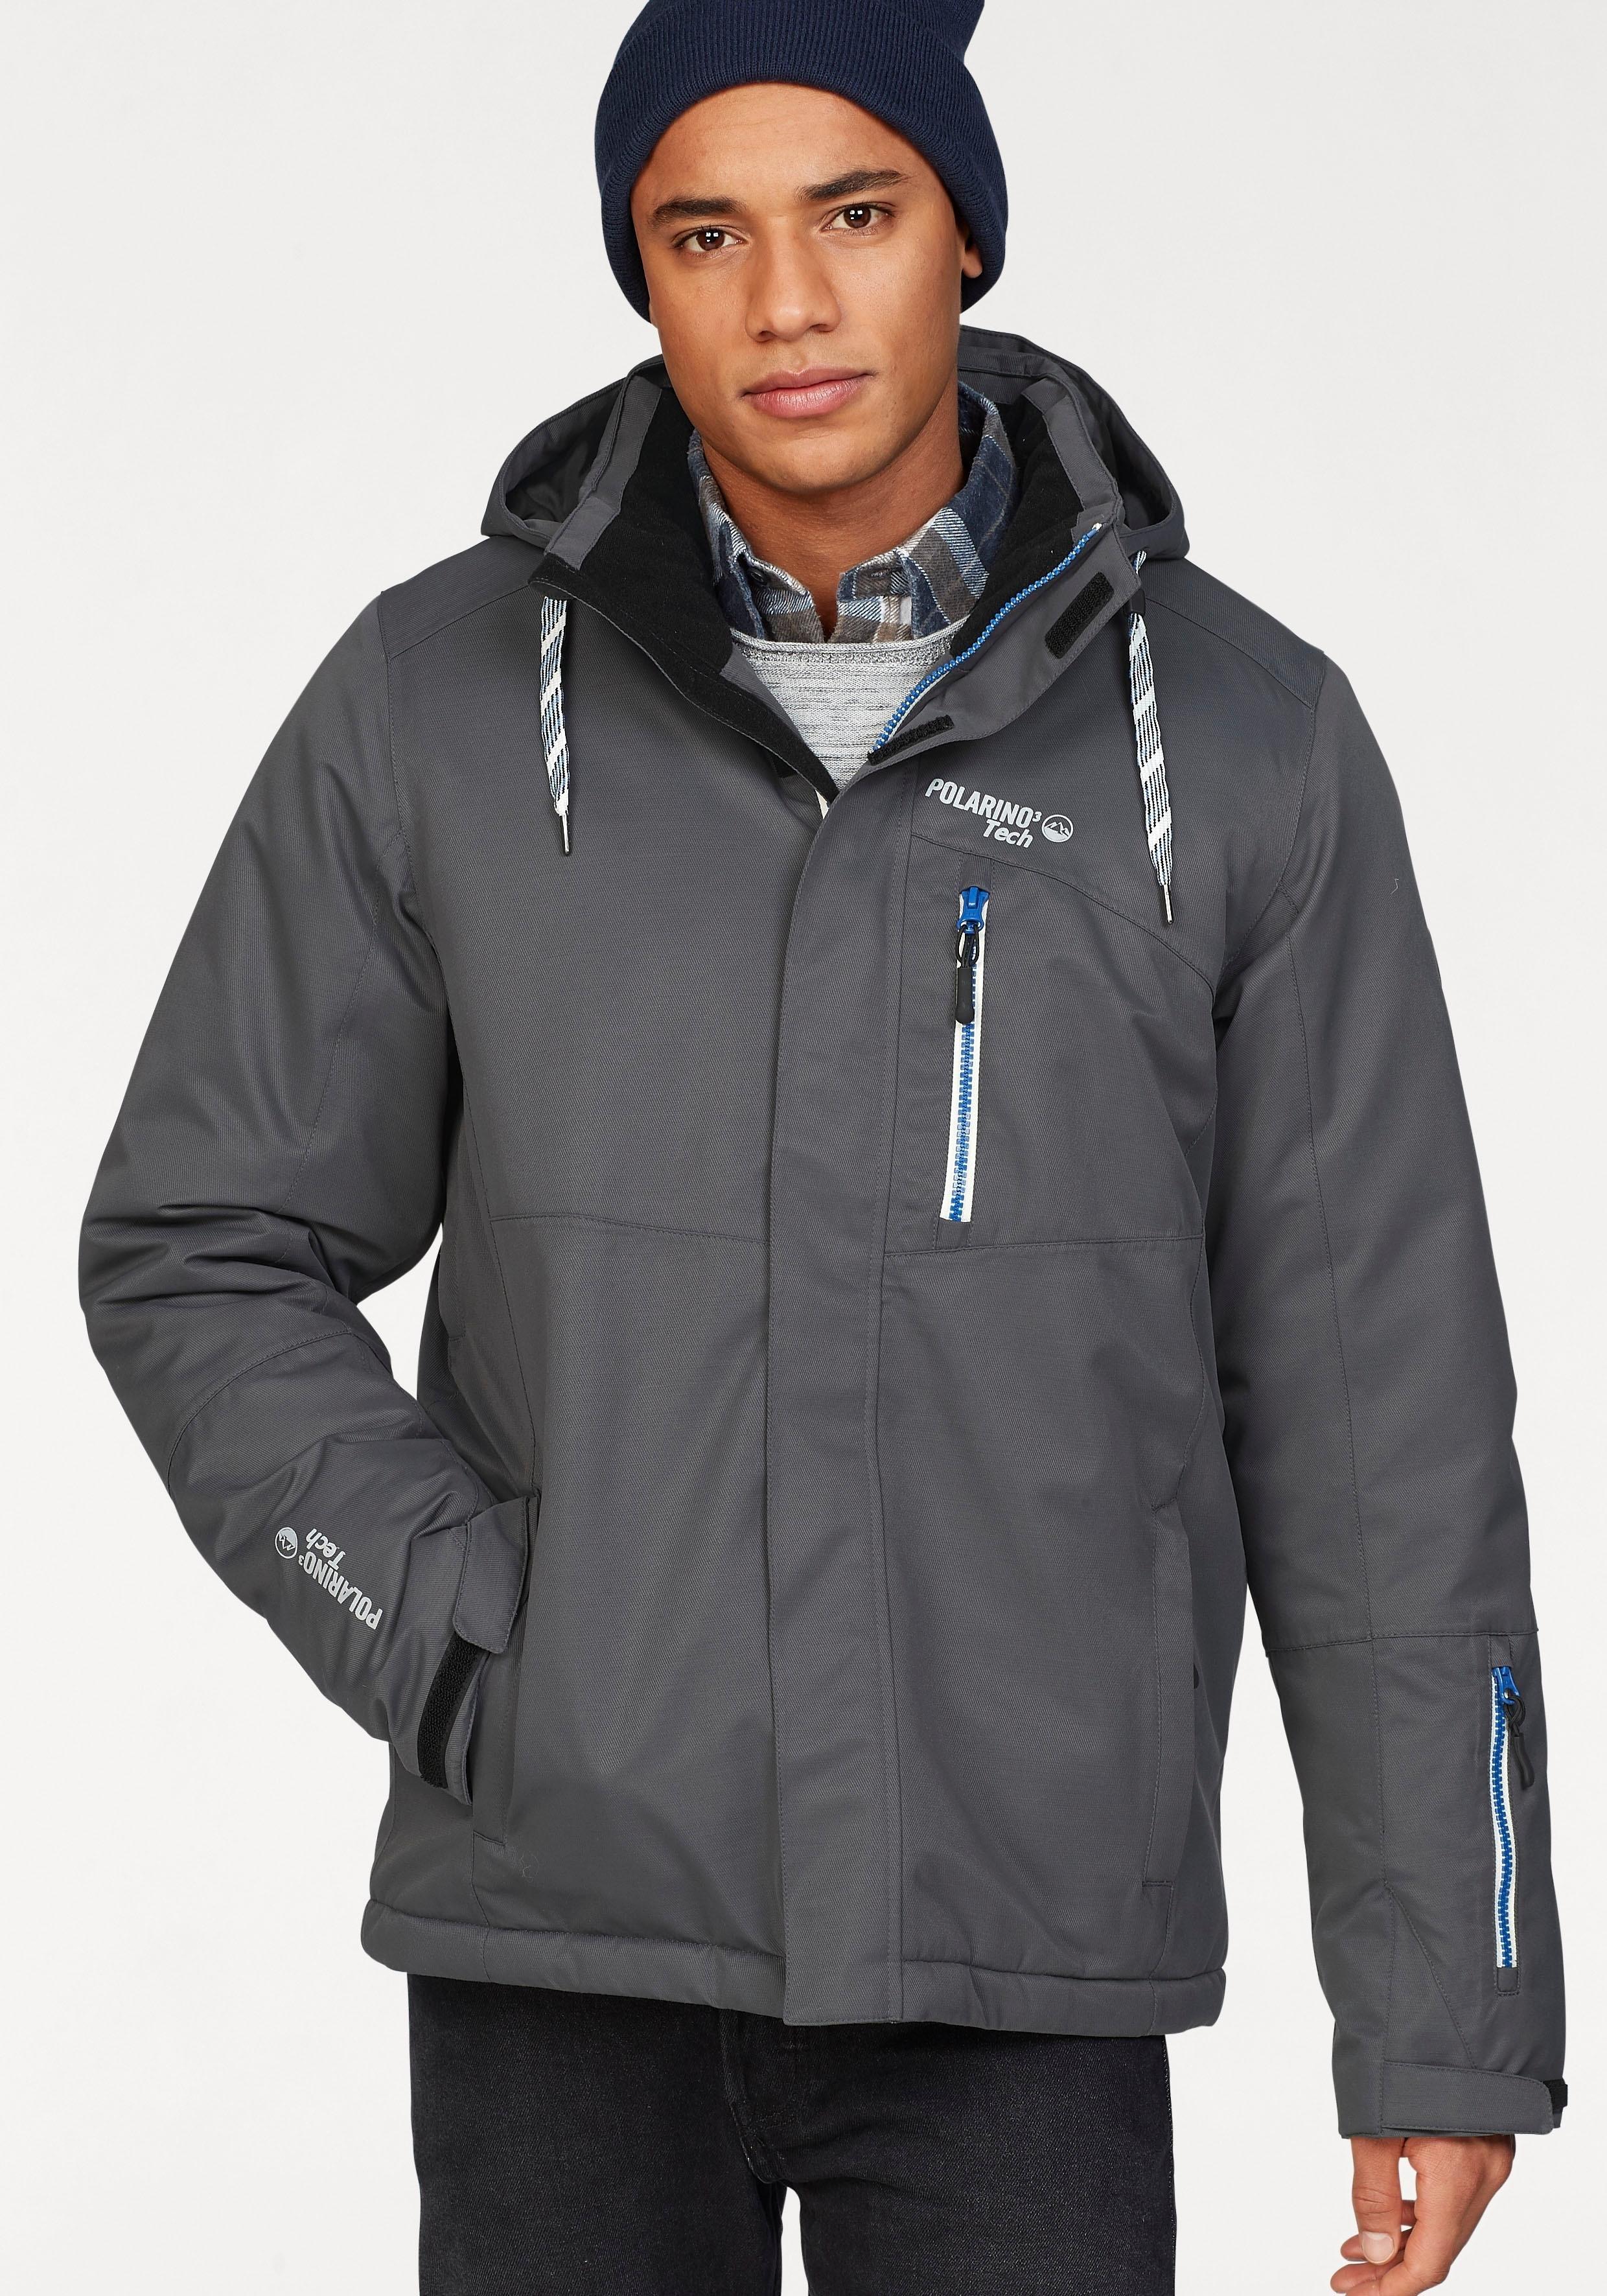 Polarino ski-jack goedkoop op otto.nl kopen